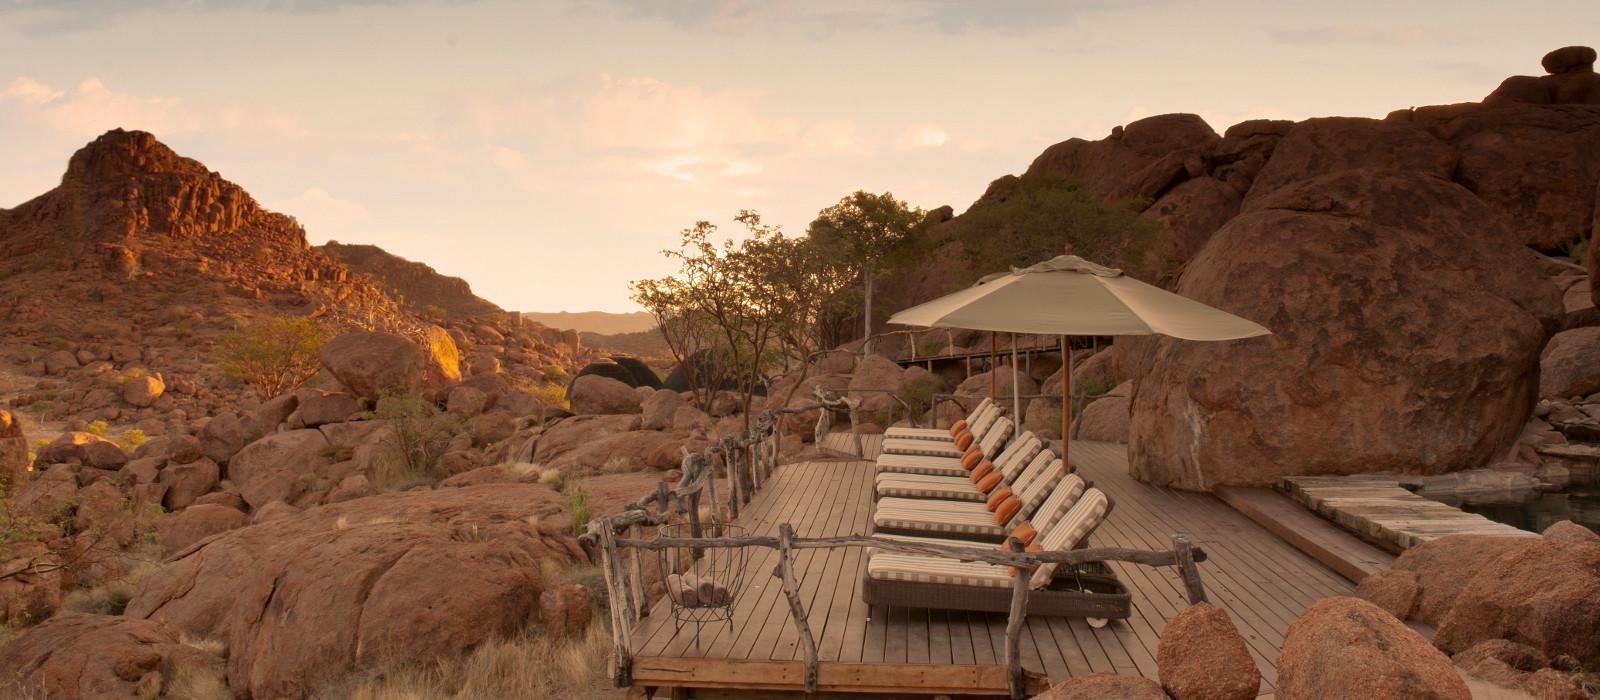 Hotel Mowani Mountain Camp Namibia